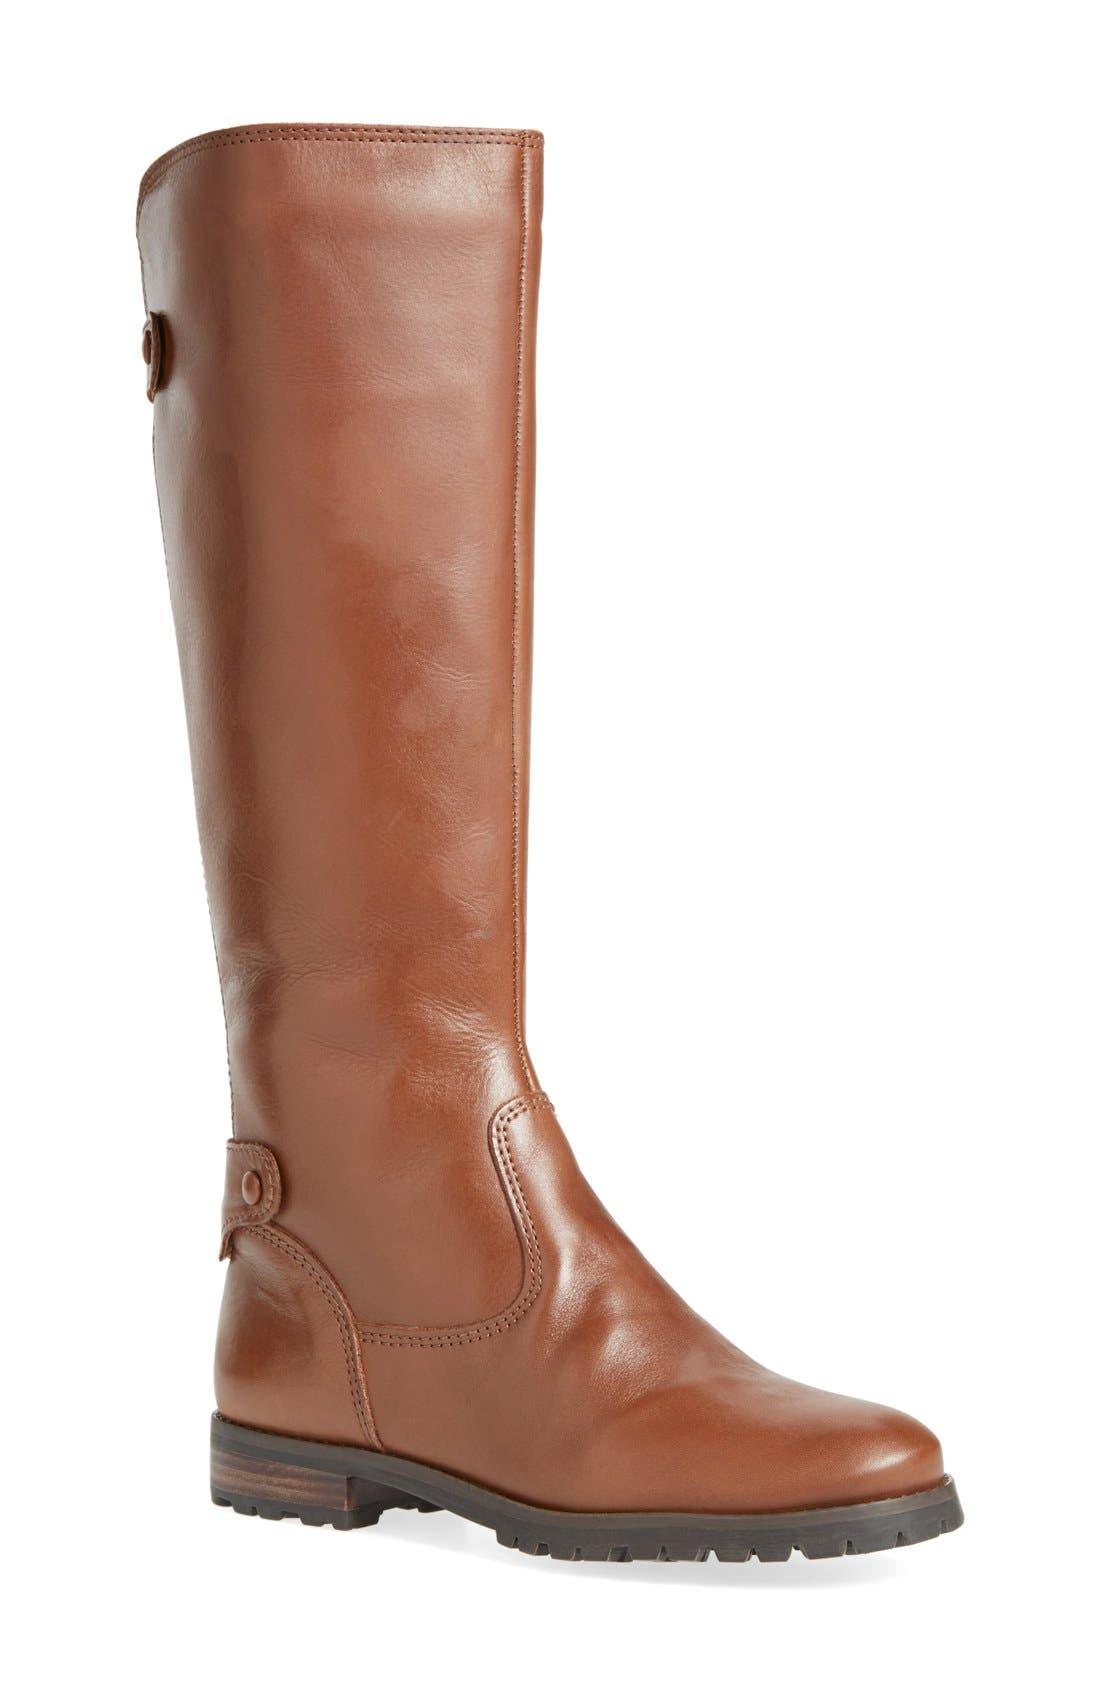 Alternate Image 1 Selected - CorsoComo 'Wallace' Tall Boot (Women)